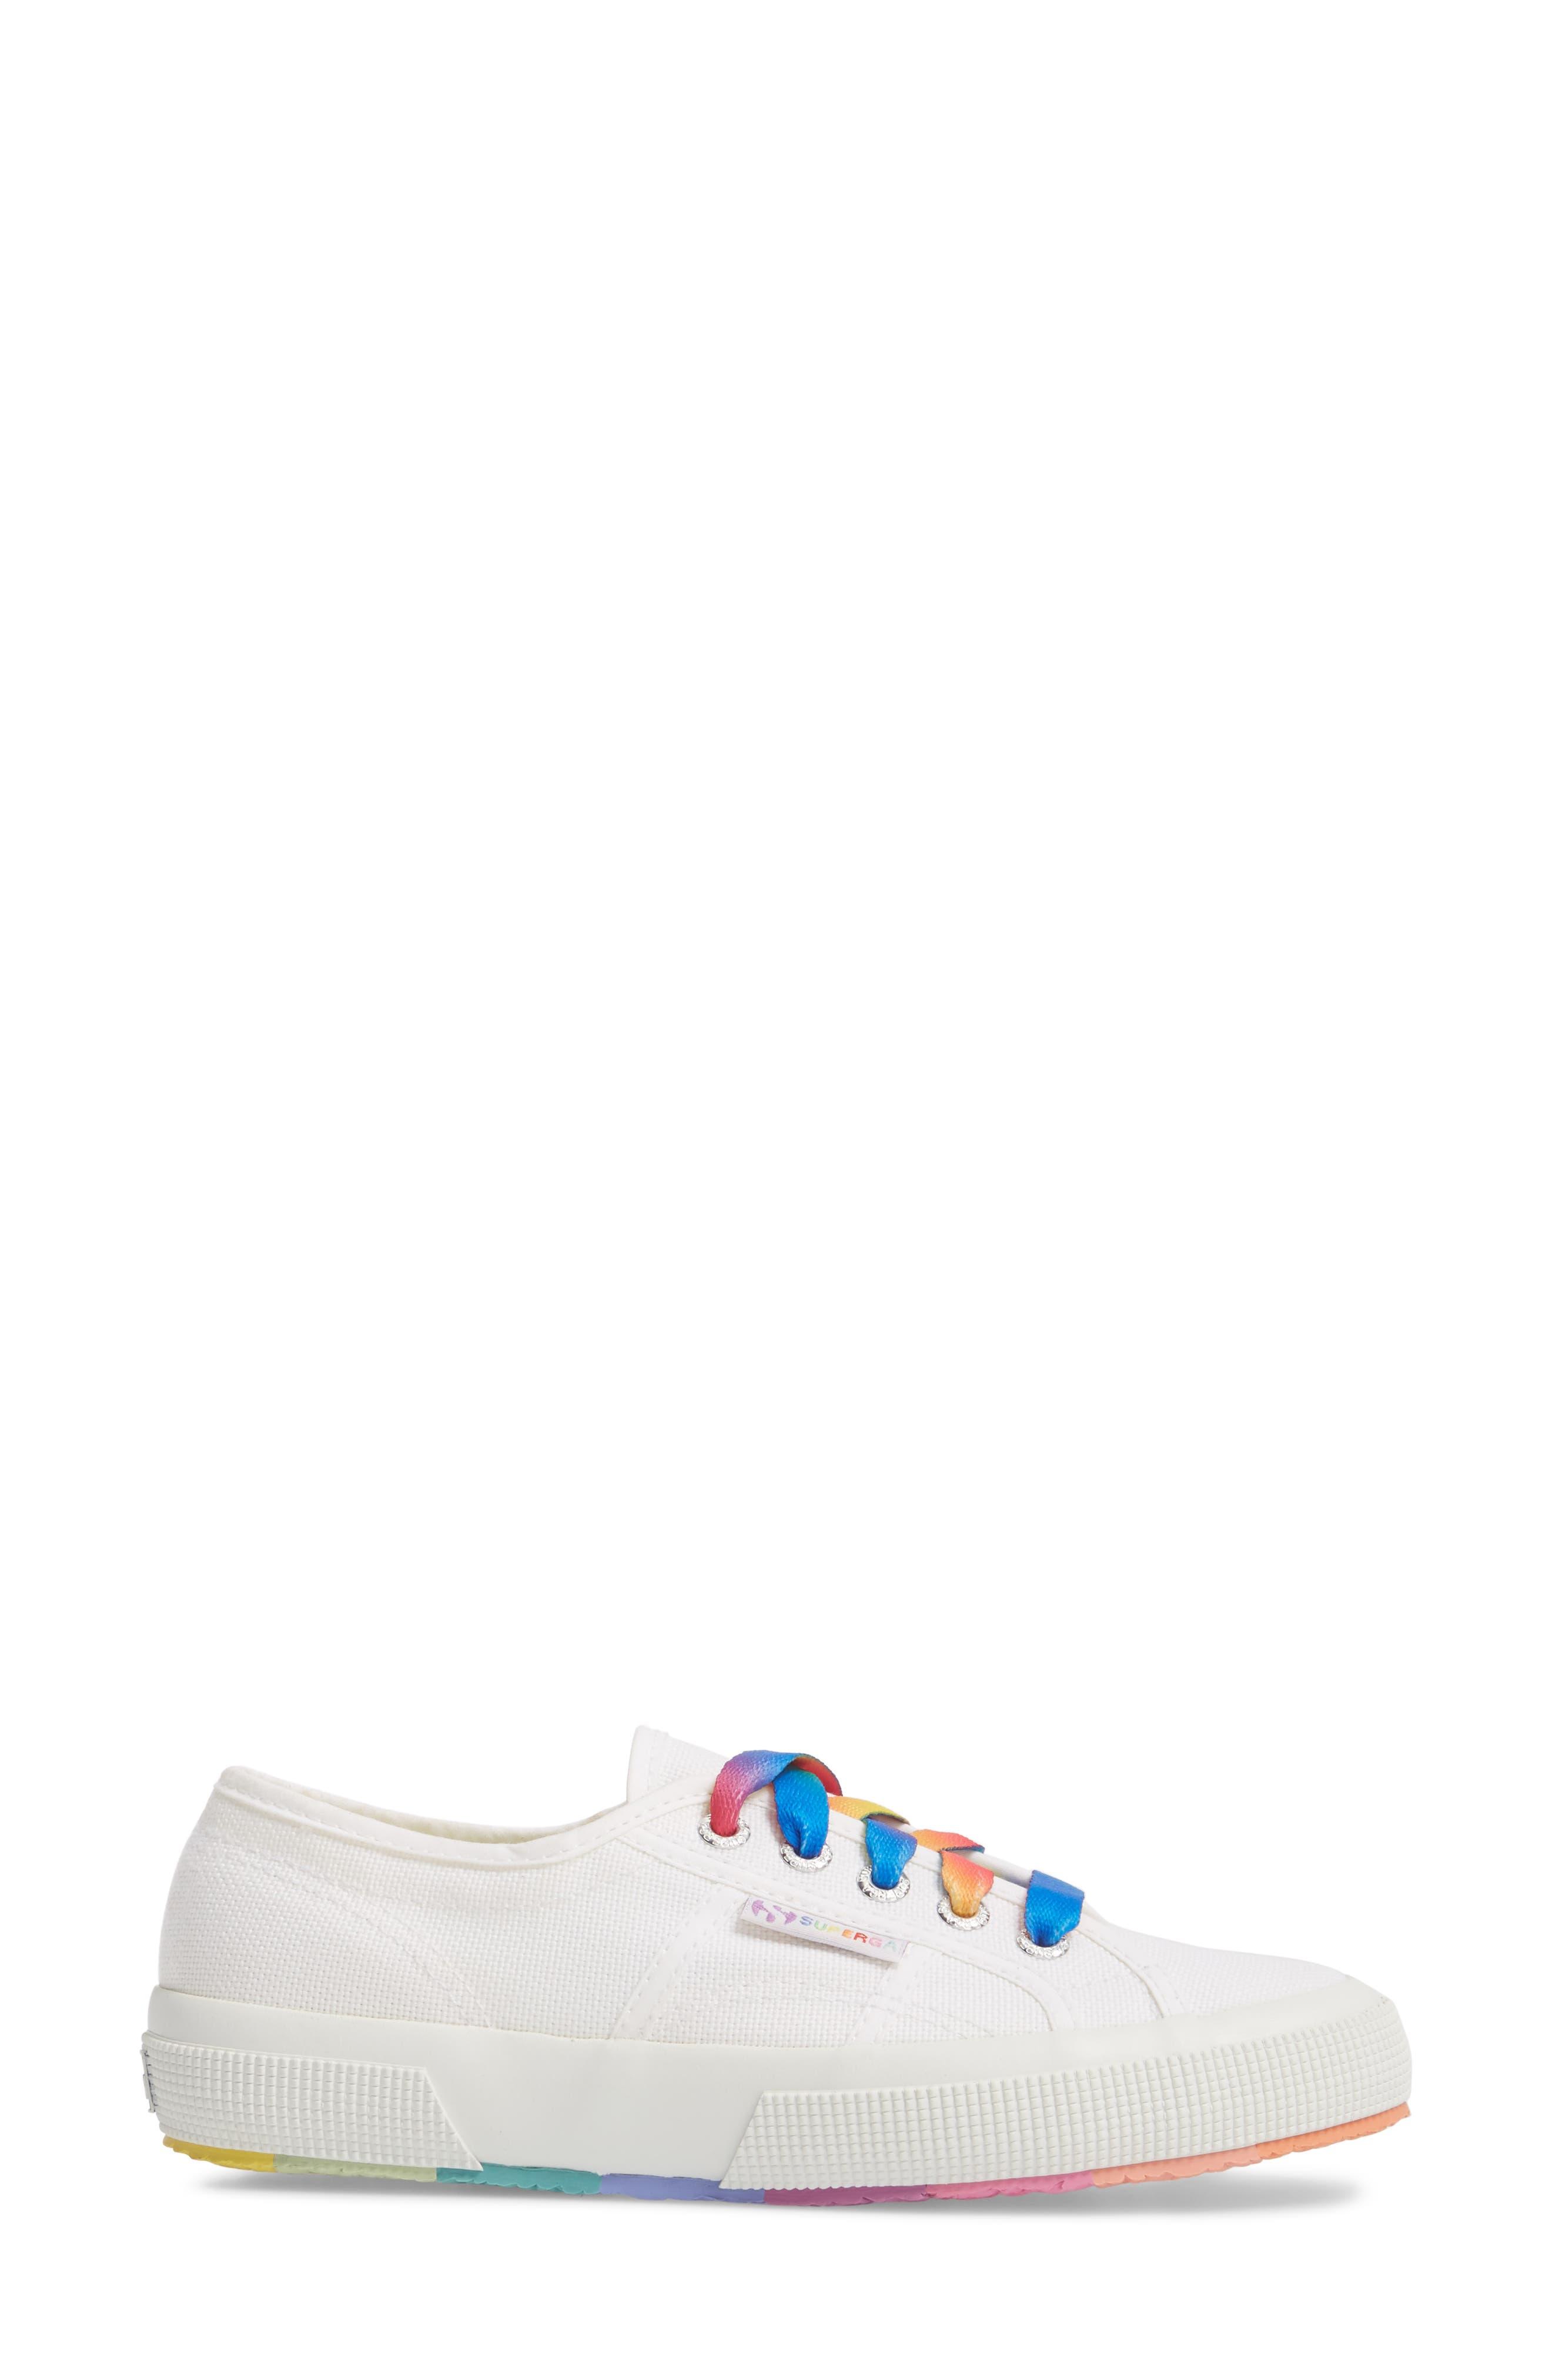 2750 Multicolor Sneaker,                             Alternate thumbnail 3, color,